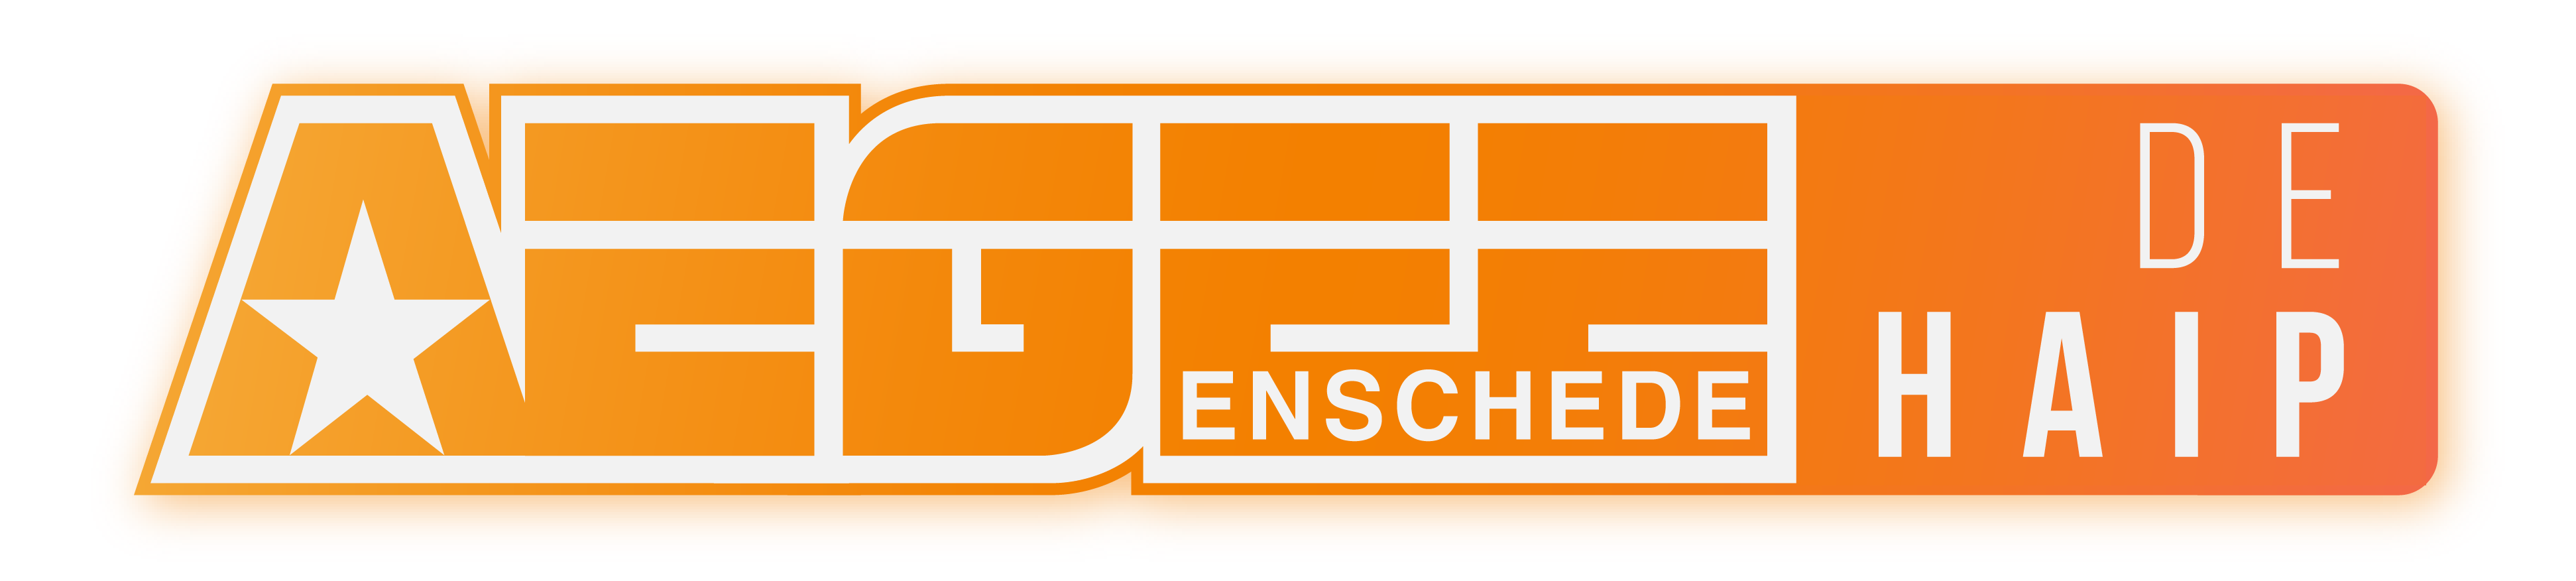 Logo AEGEE HAIP20